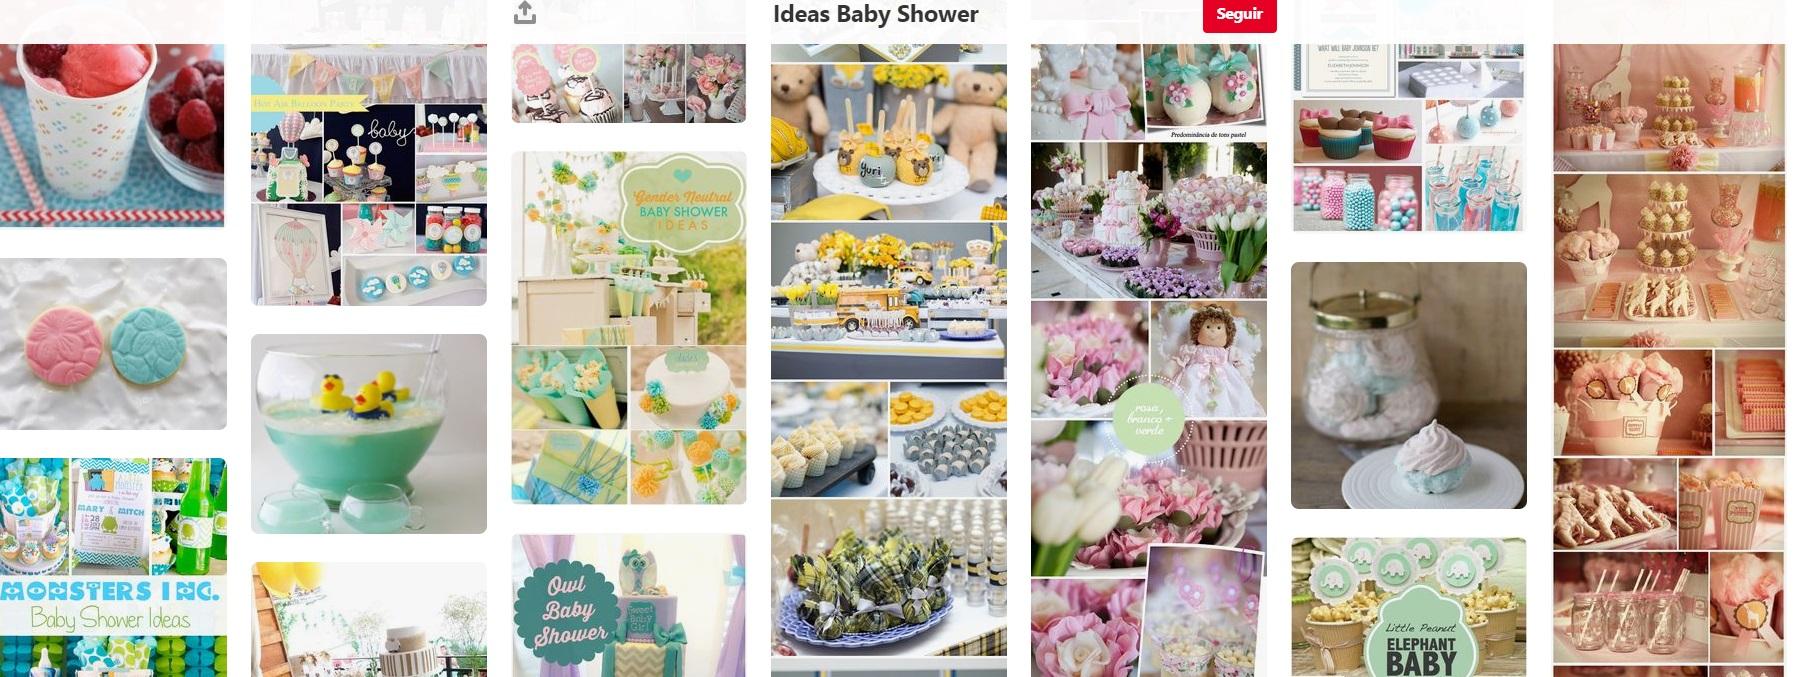 como-organizar-baby-shower